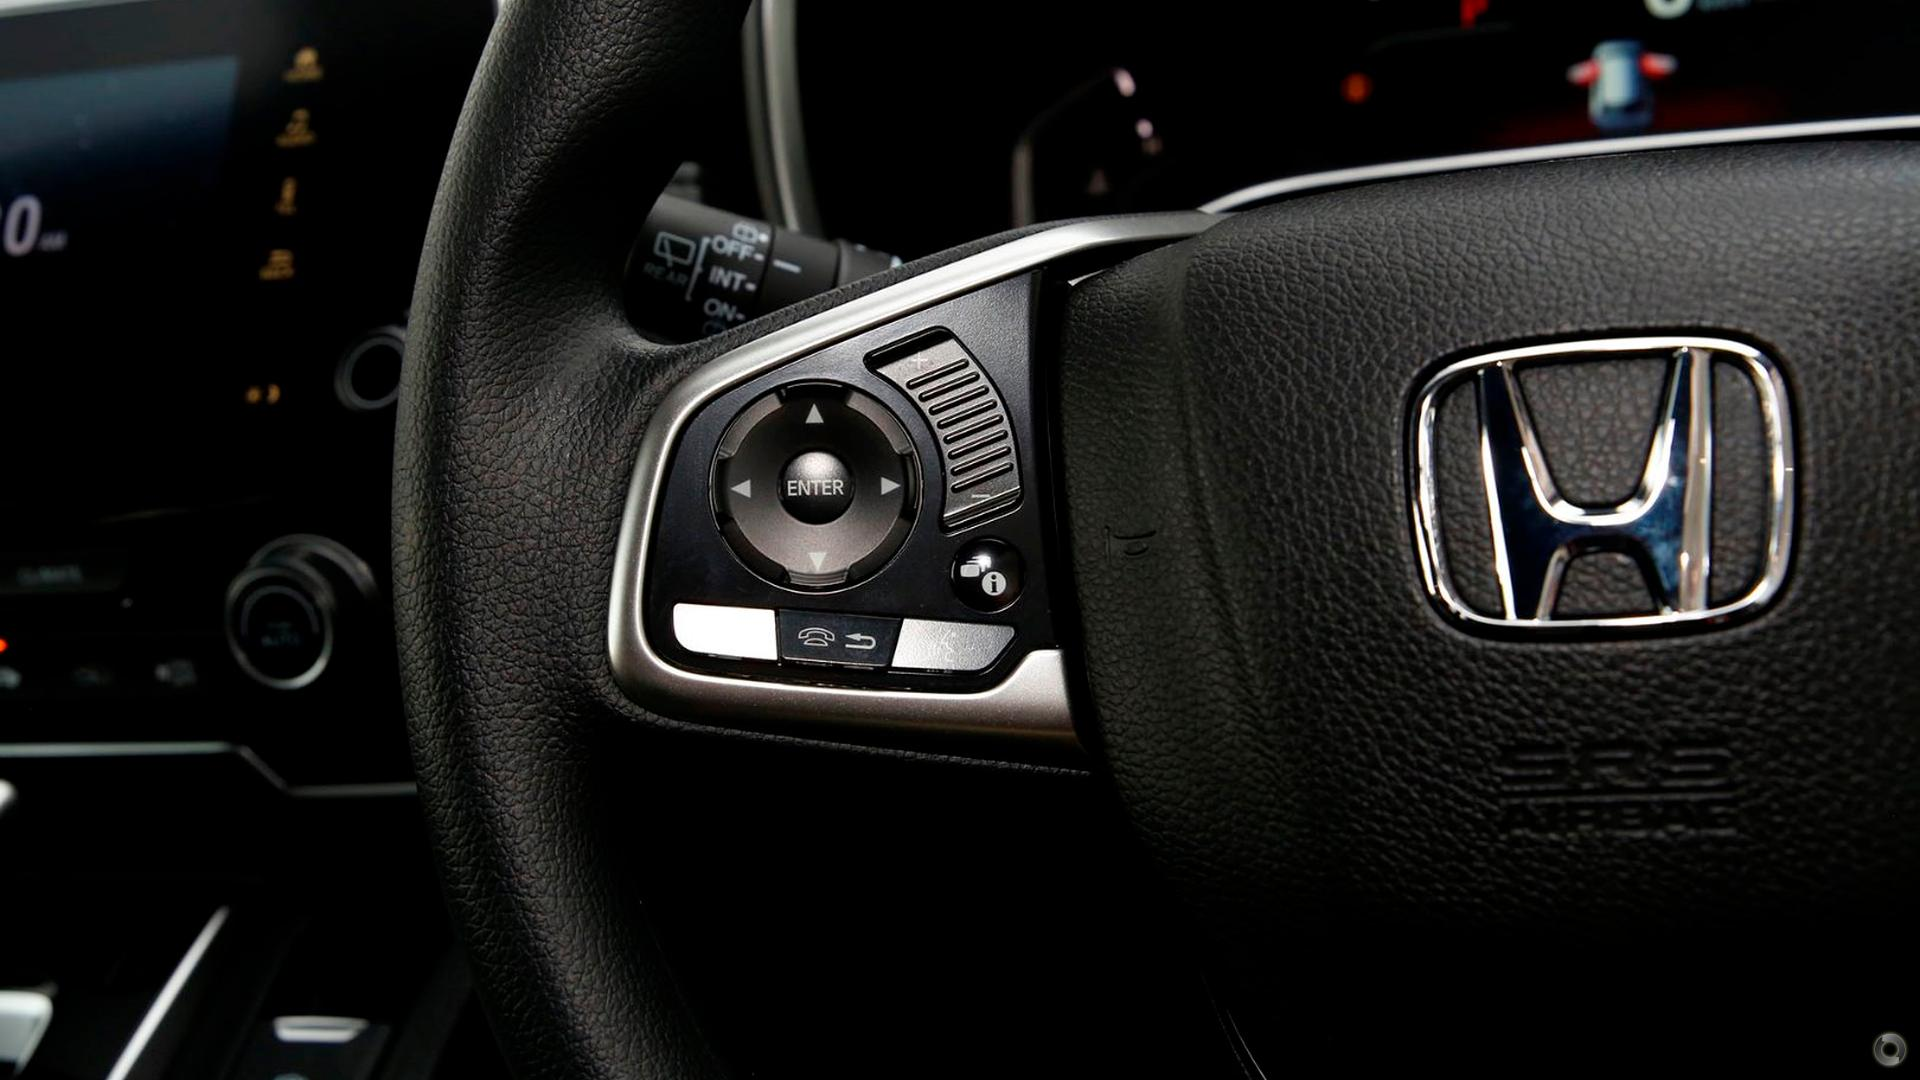 2018 Honda Cr-v +Sport RW